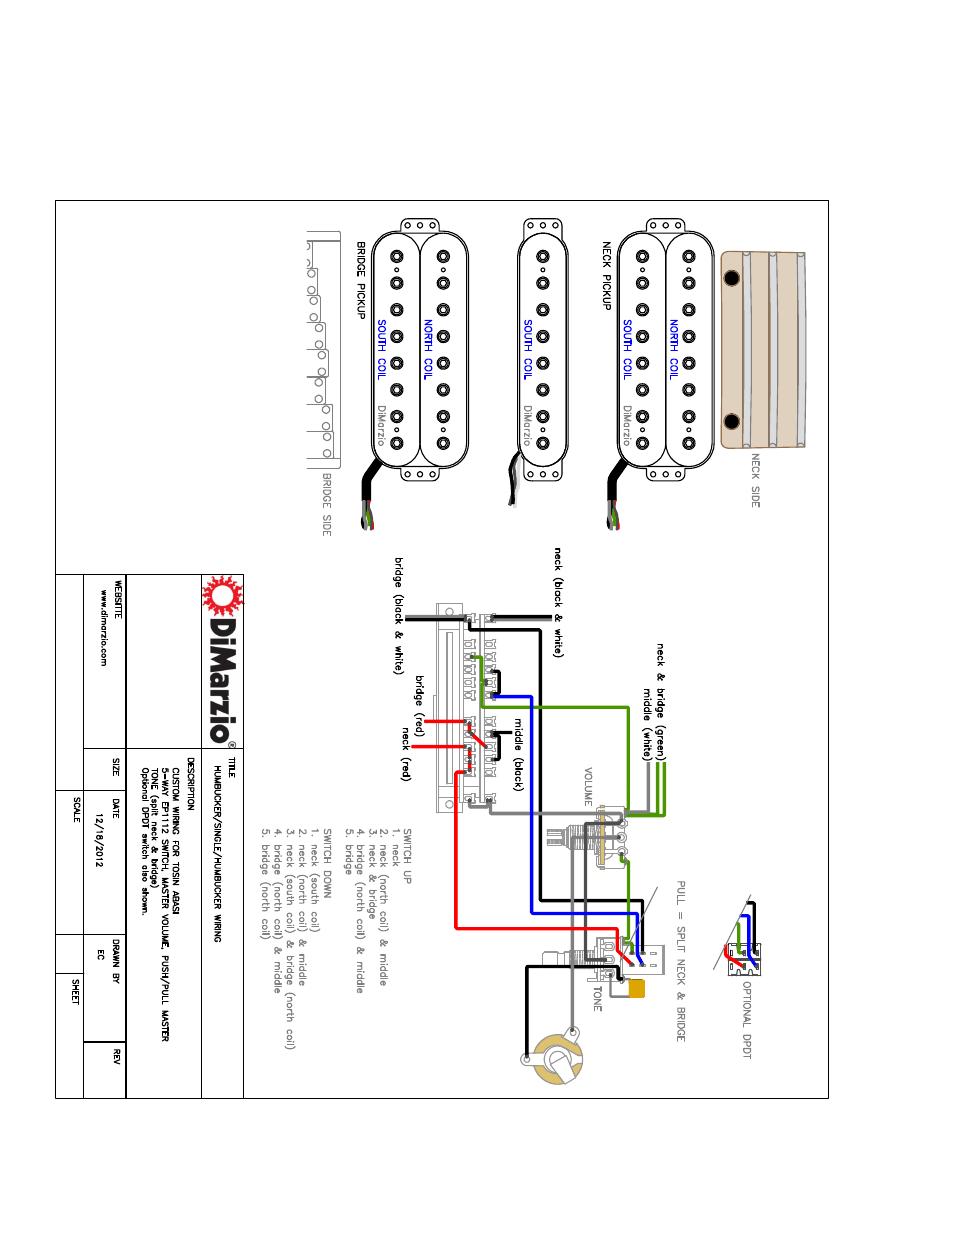 hight resolution of dimarzio 5 way switch wiring diagram 36 wiring diagram rotary lamp switch wiring diagram rotary switch wiring diagram forward and reverse